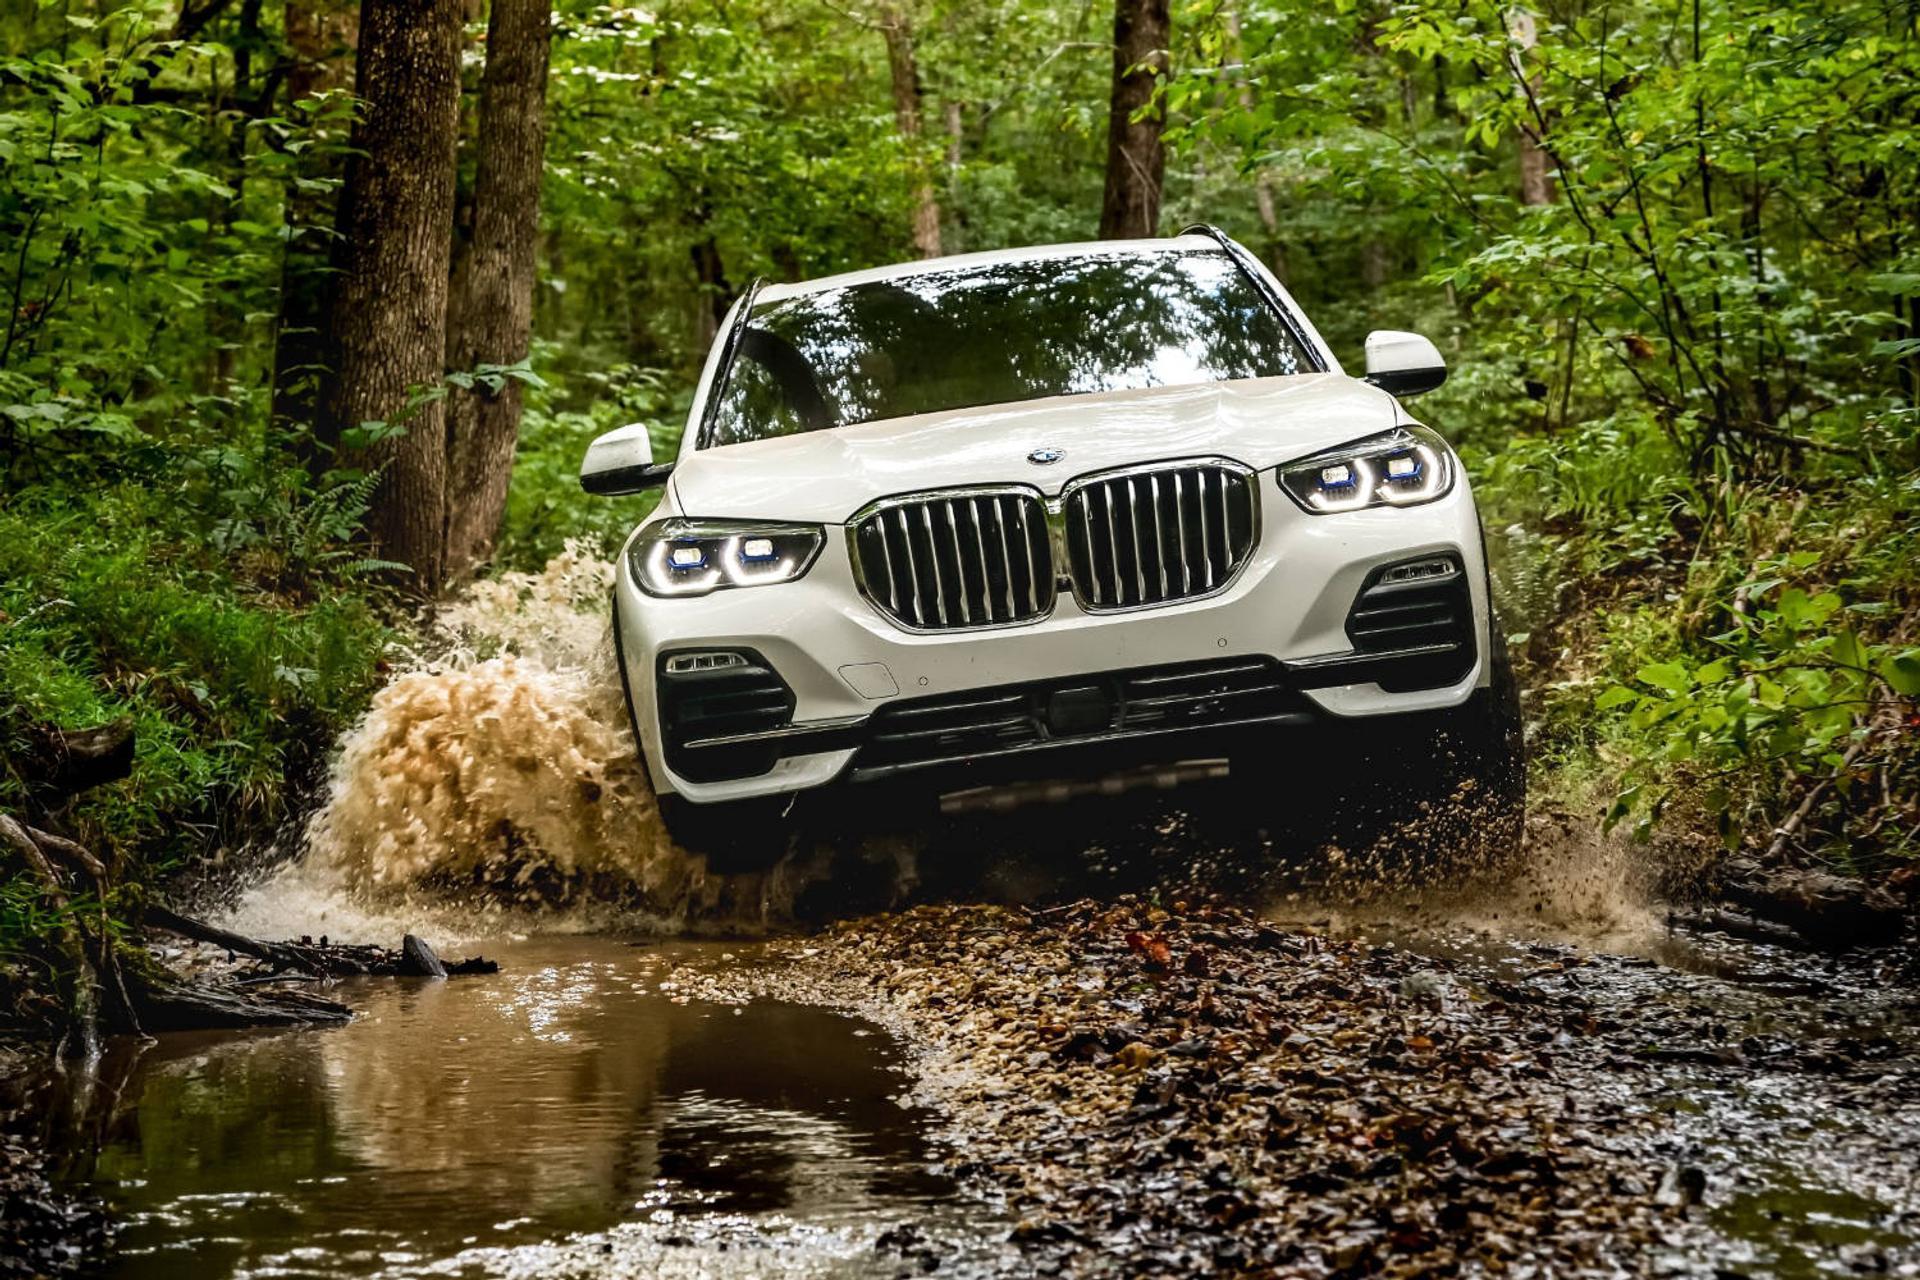 BMW X5 off-roading